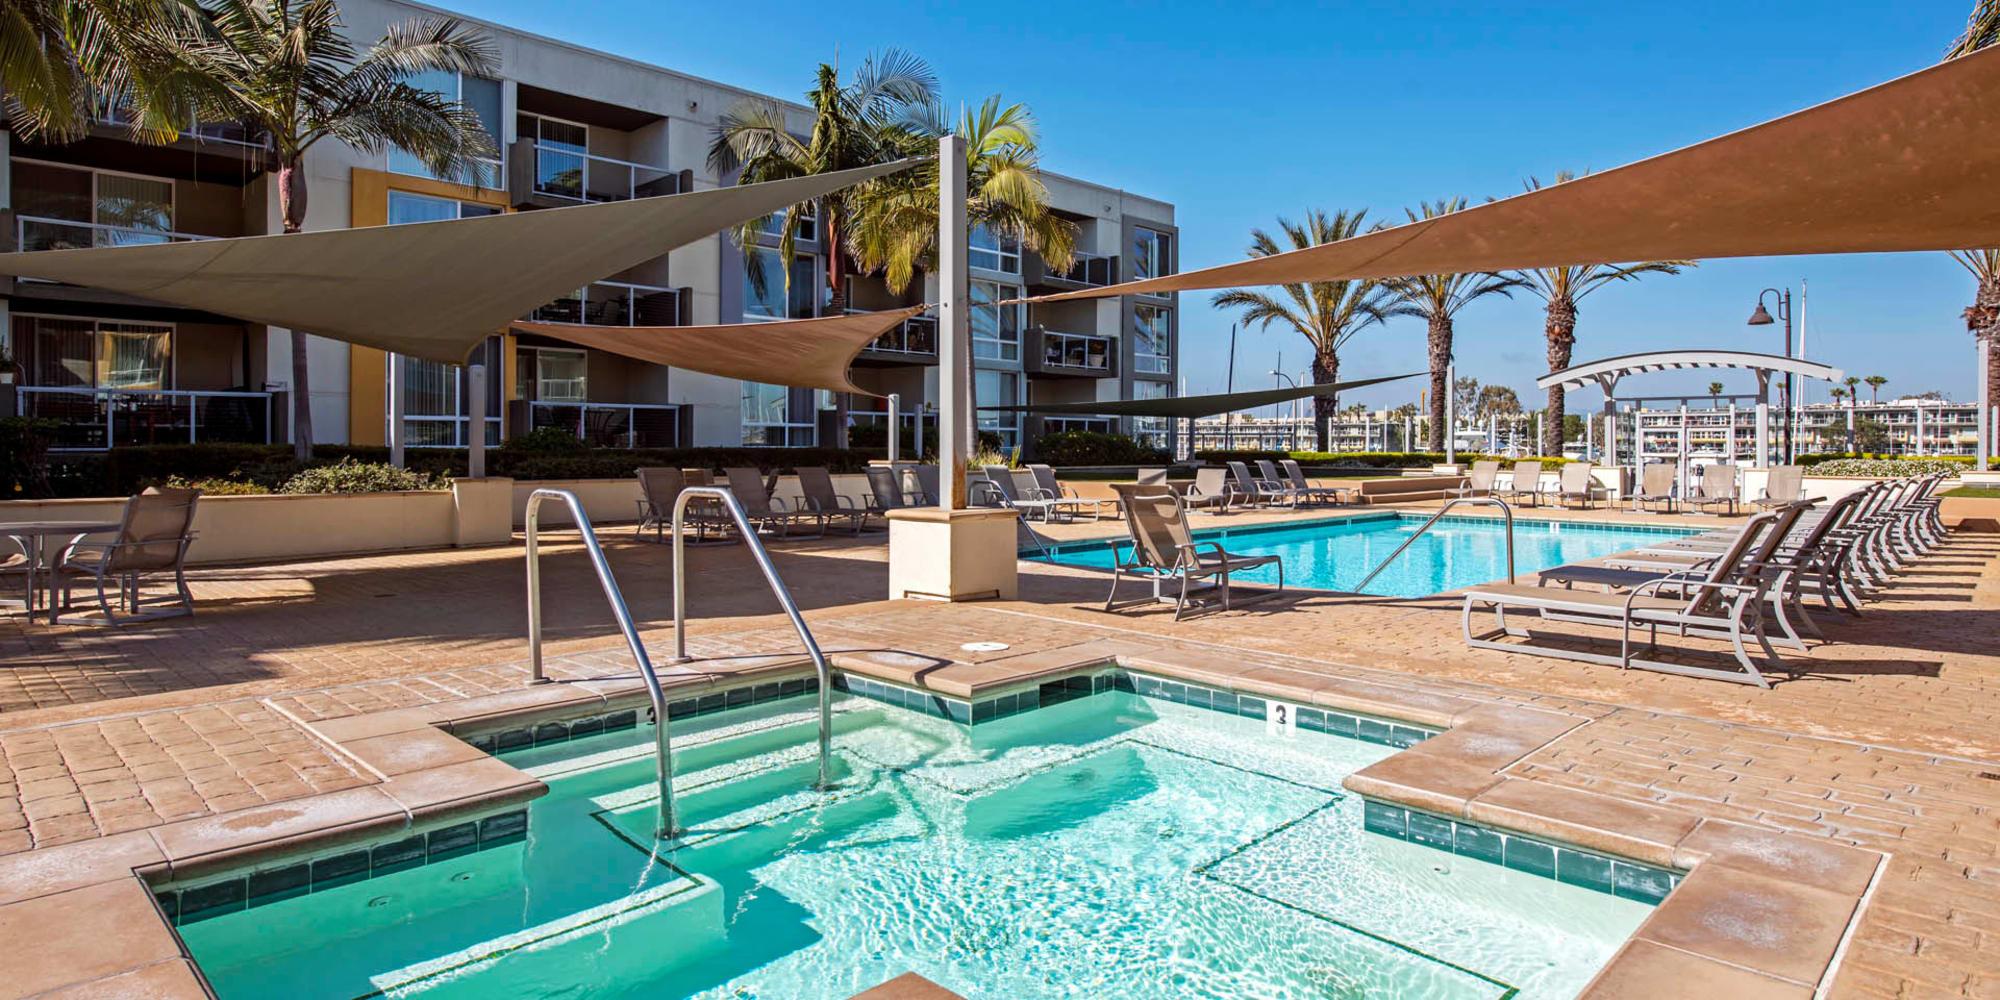 Spa area near the pool at Waters Edge at Marina Harbor in Marina Del Rey, California